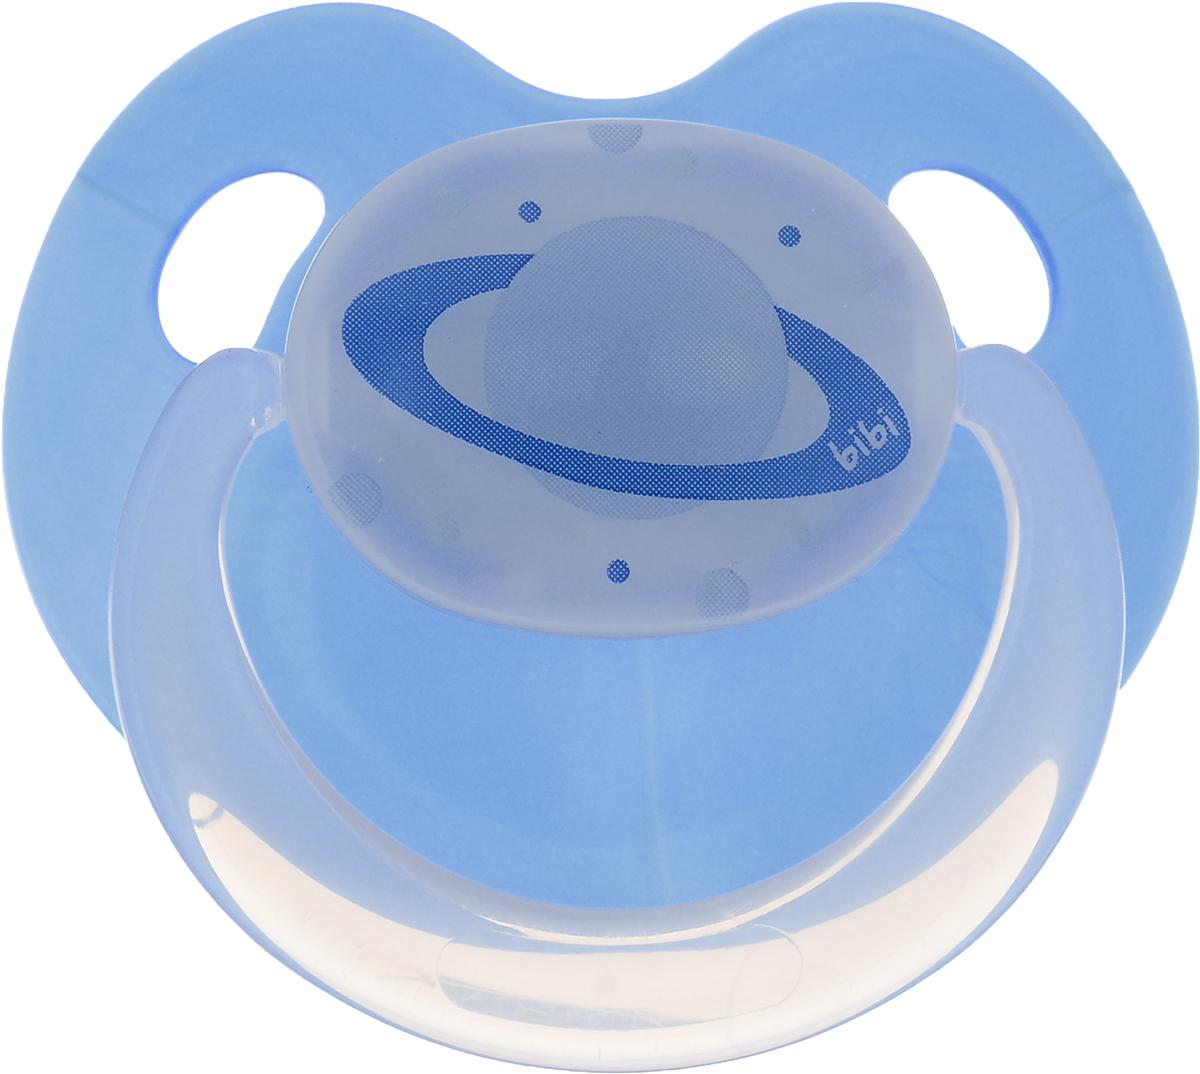 Bibi Пустышка силиконовая Dental Glow in the Dark от 0 до 6 месяцев цвет темно-синий